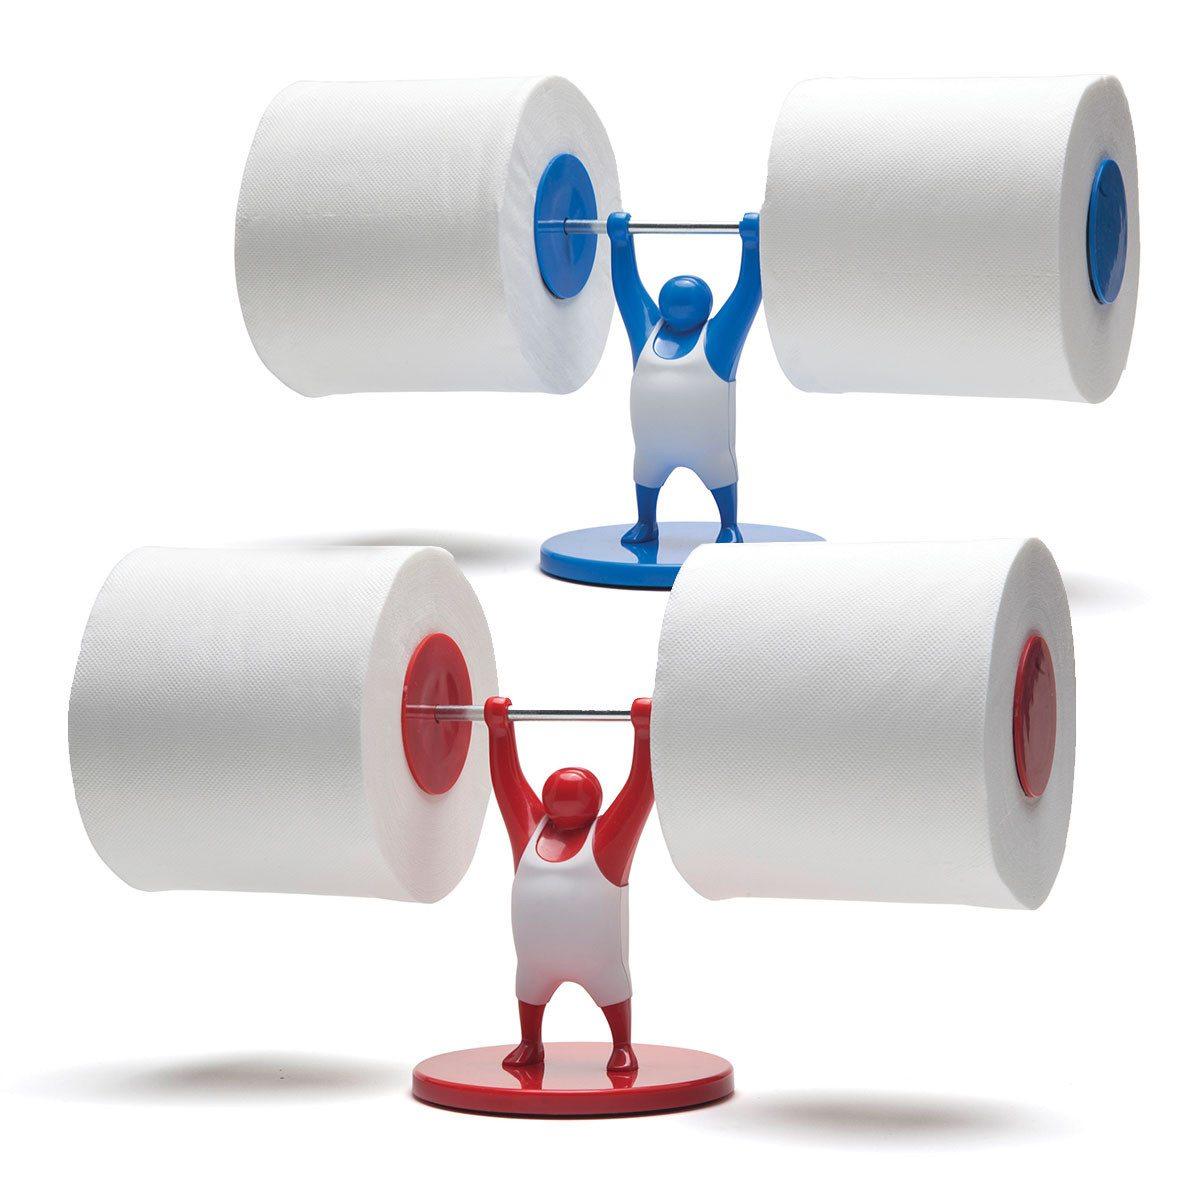 Portarrollos de papel higiénico – Sr. T